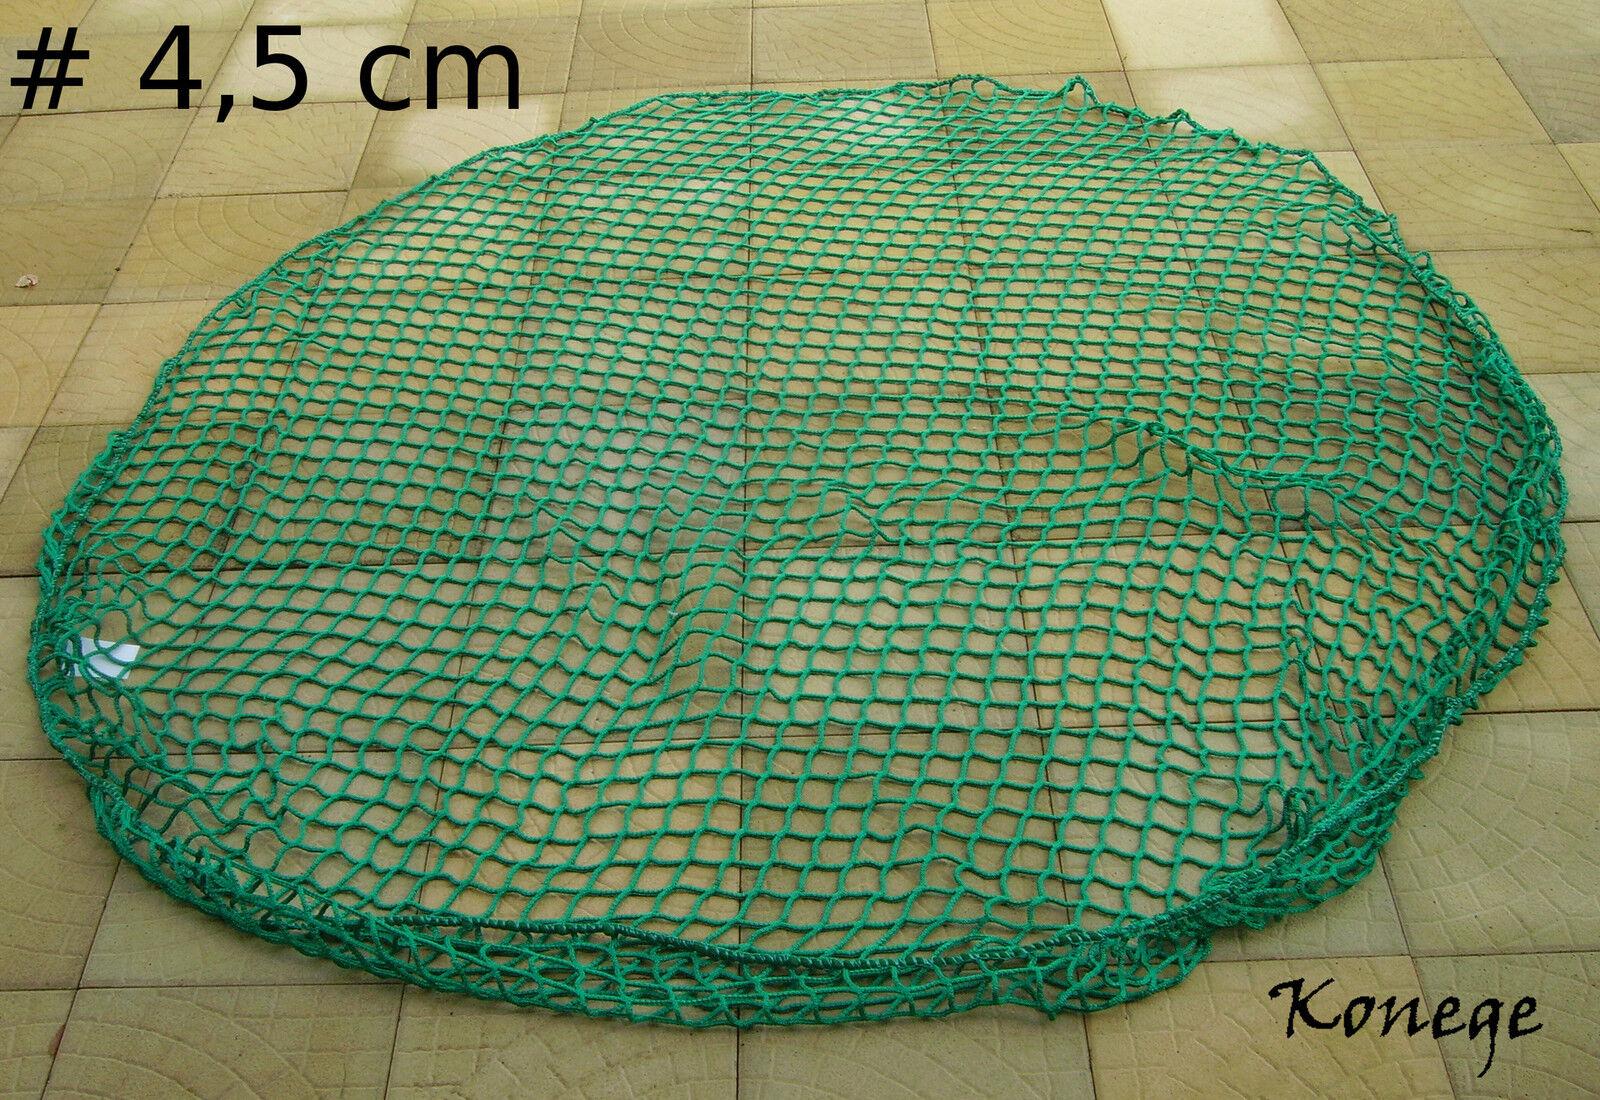 Heuraufennetz rossoondo, Ø 4,0m, MW 4,5cm, 5mm cordoncino tessuti, Heunetz per coprire